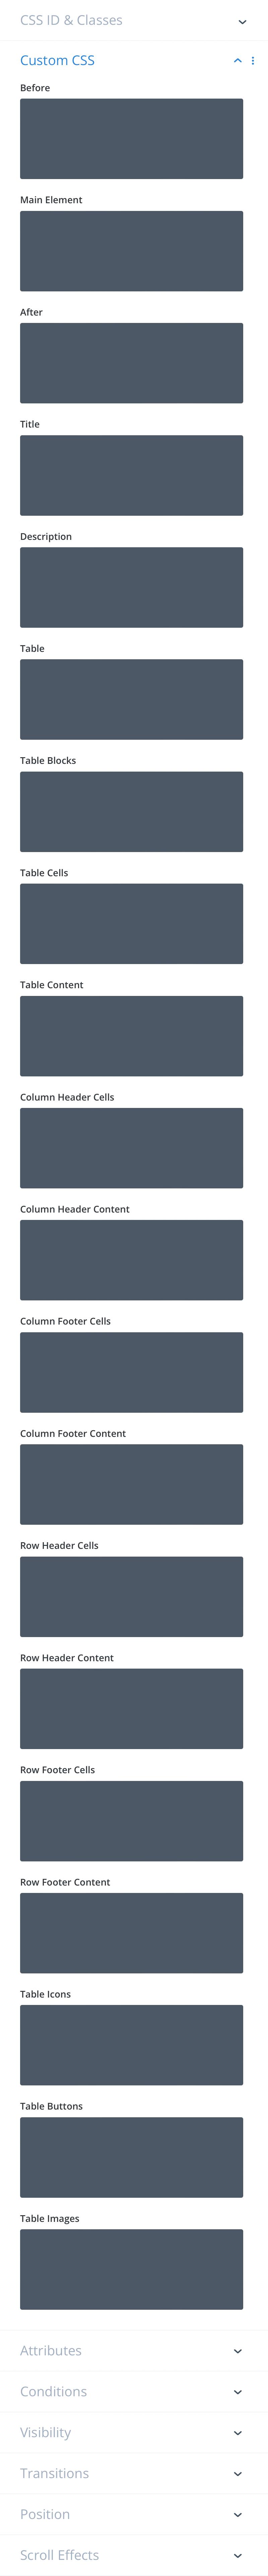 Divi-Modules – Table Maker advanced settings